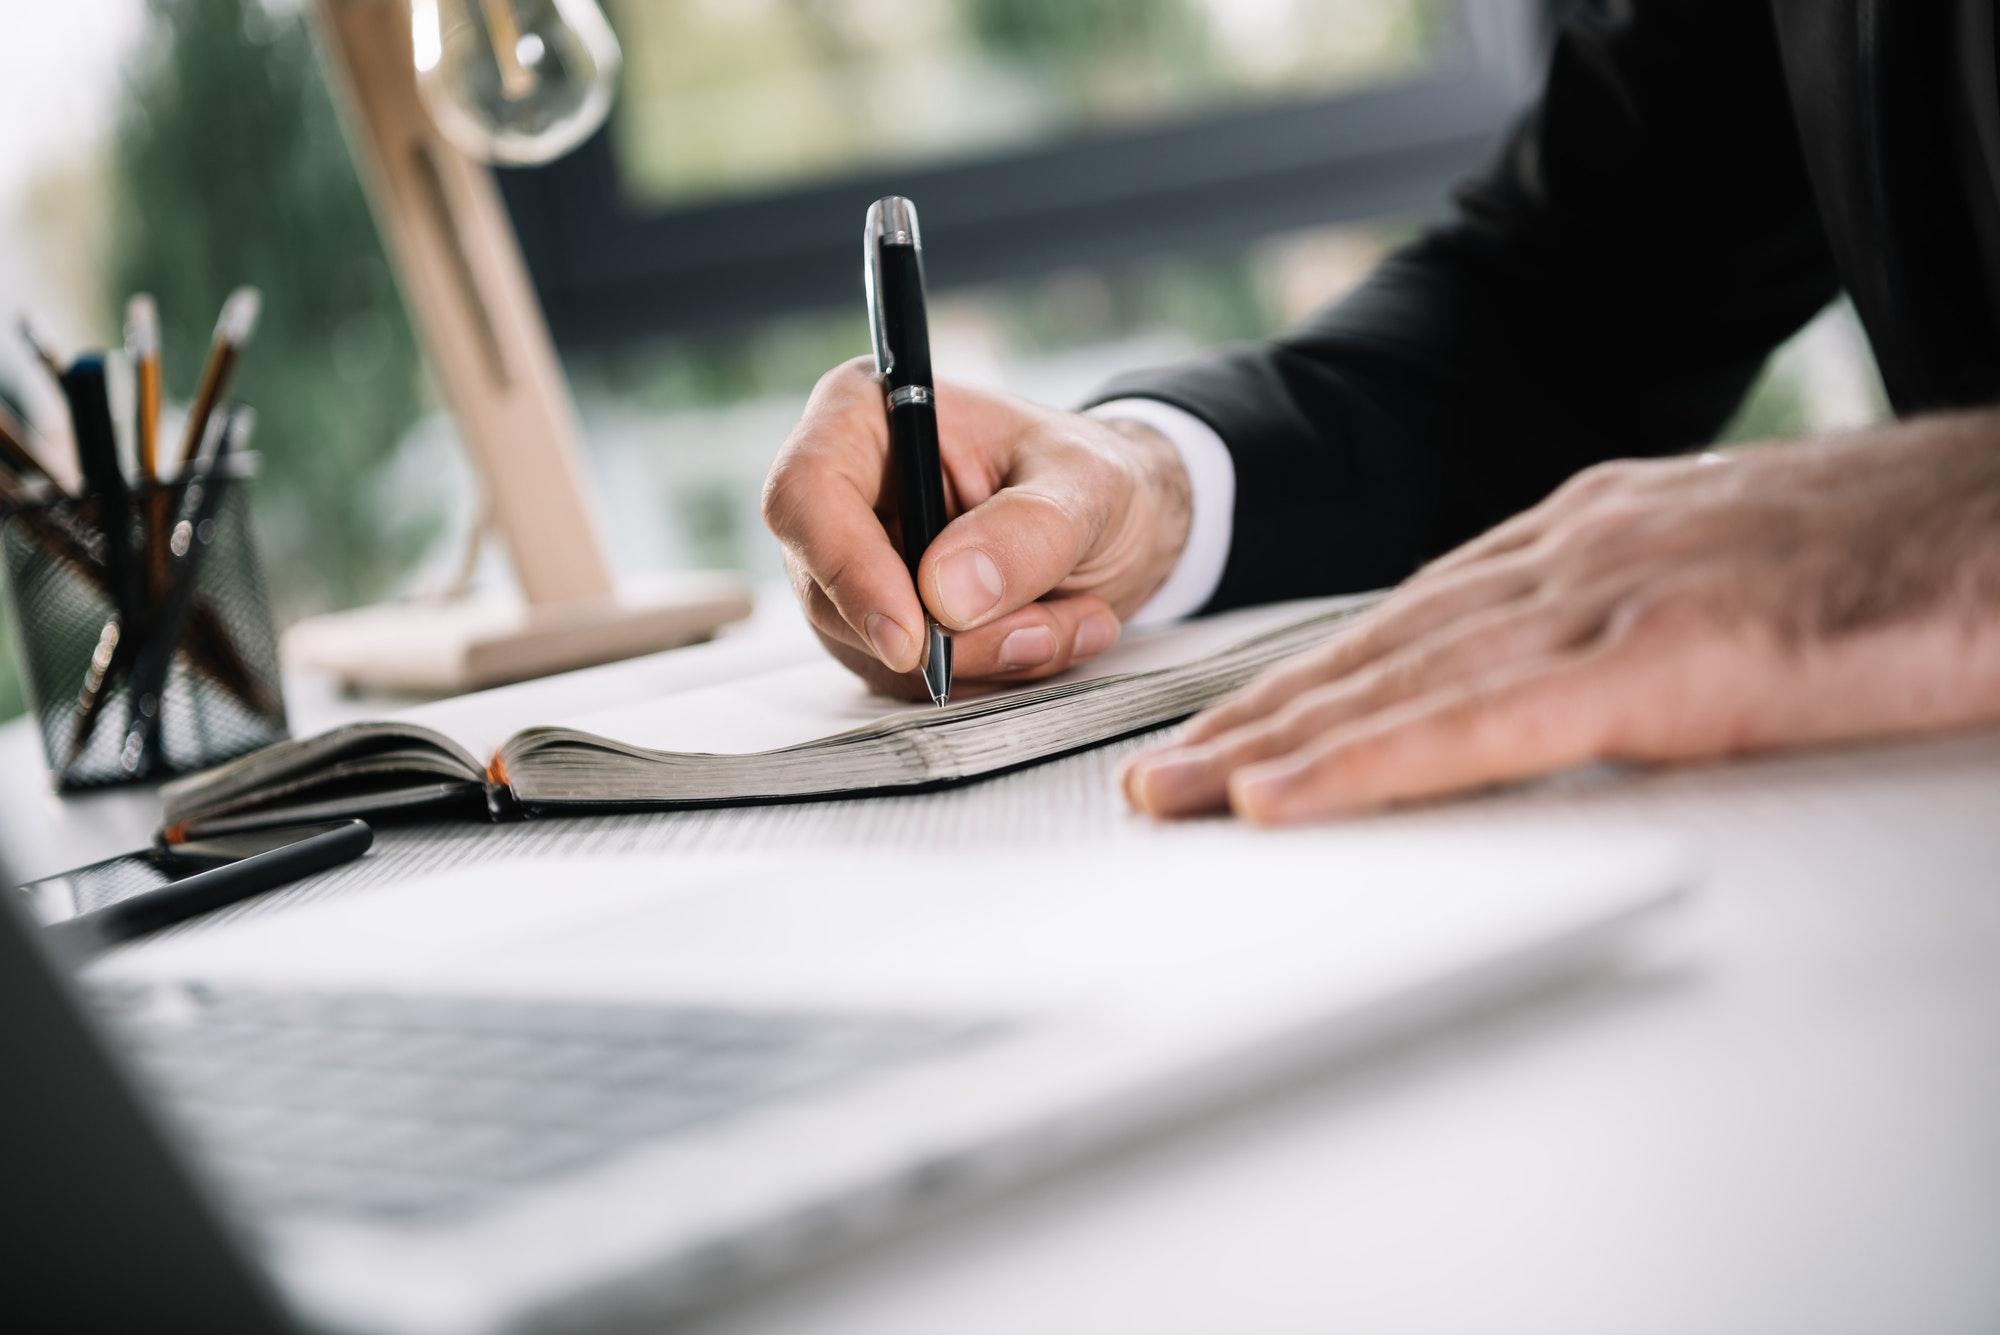 List of writing strategies: Man writing in notebook